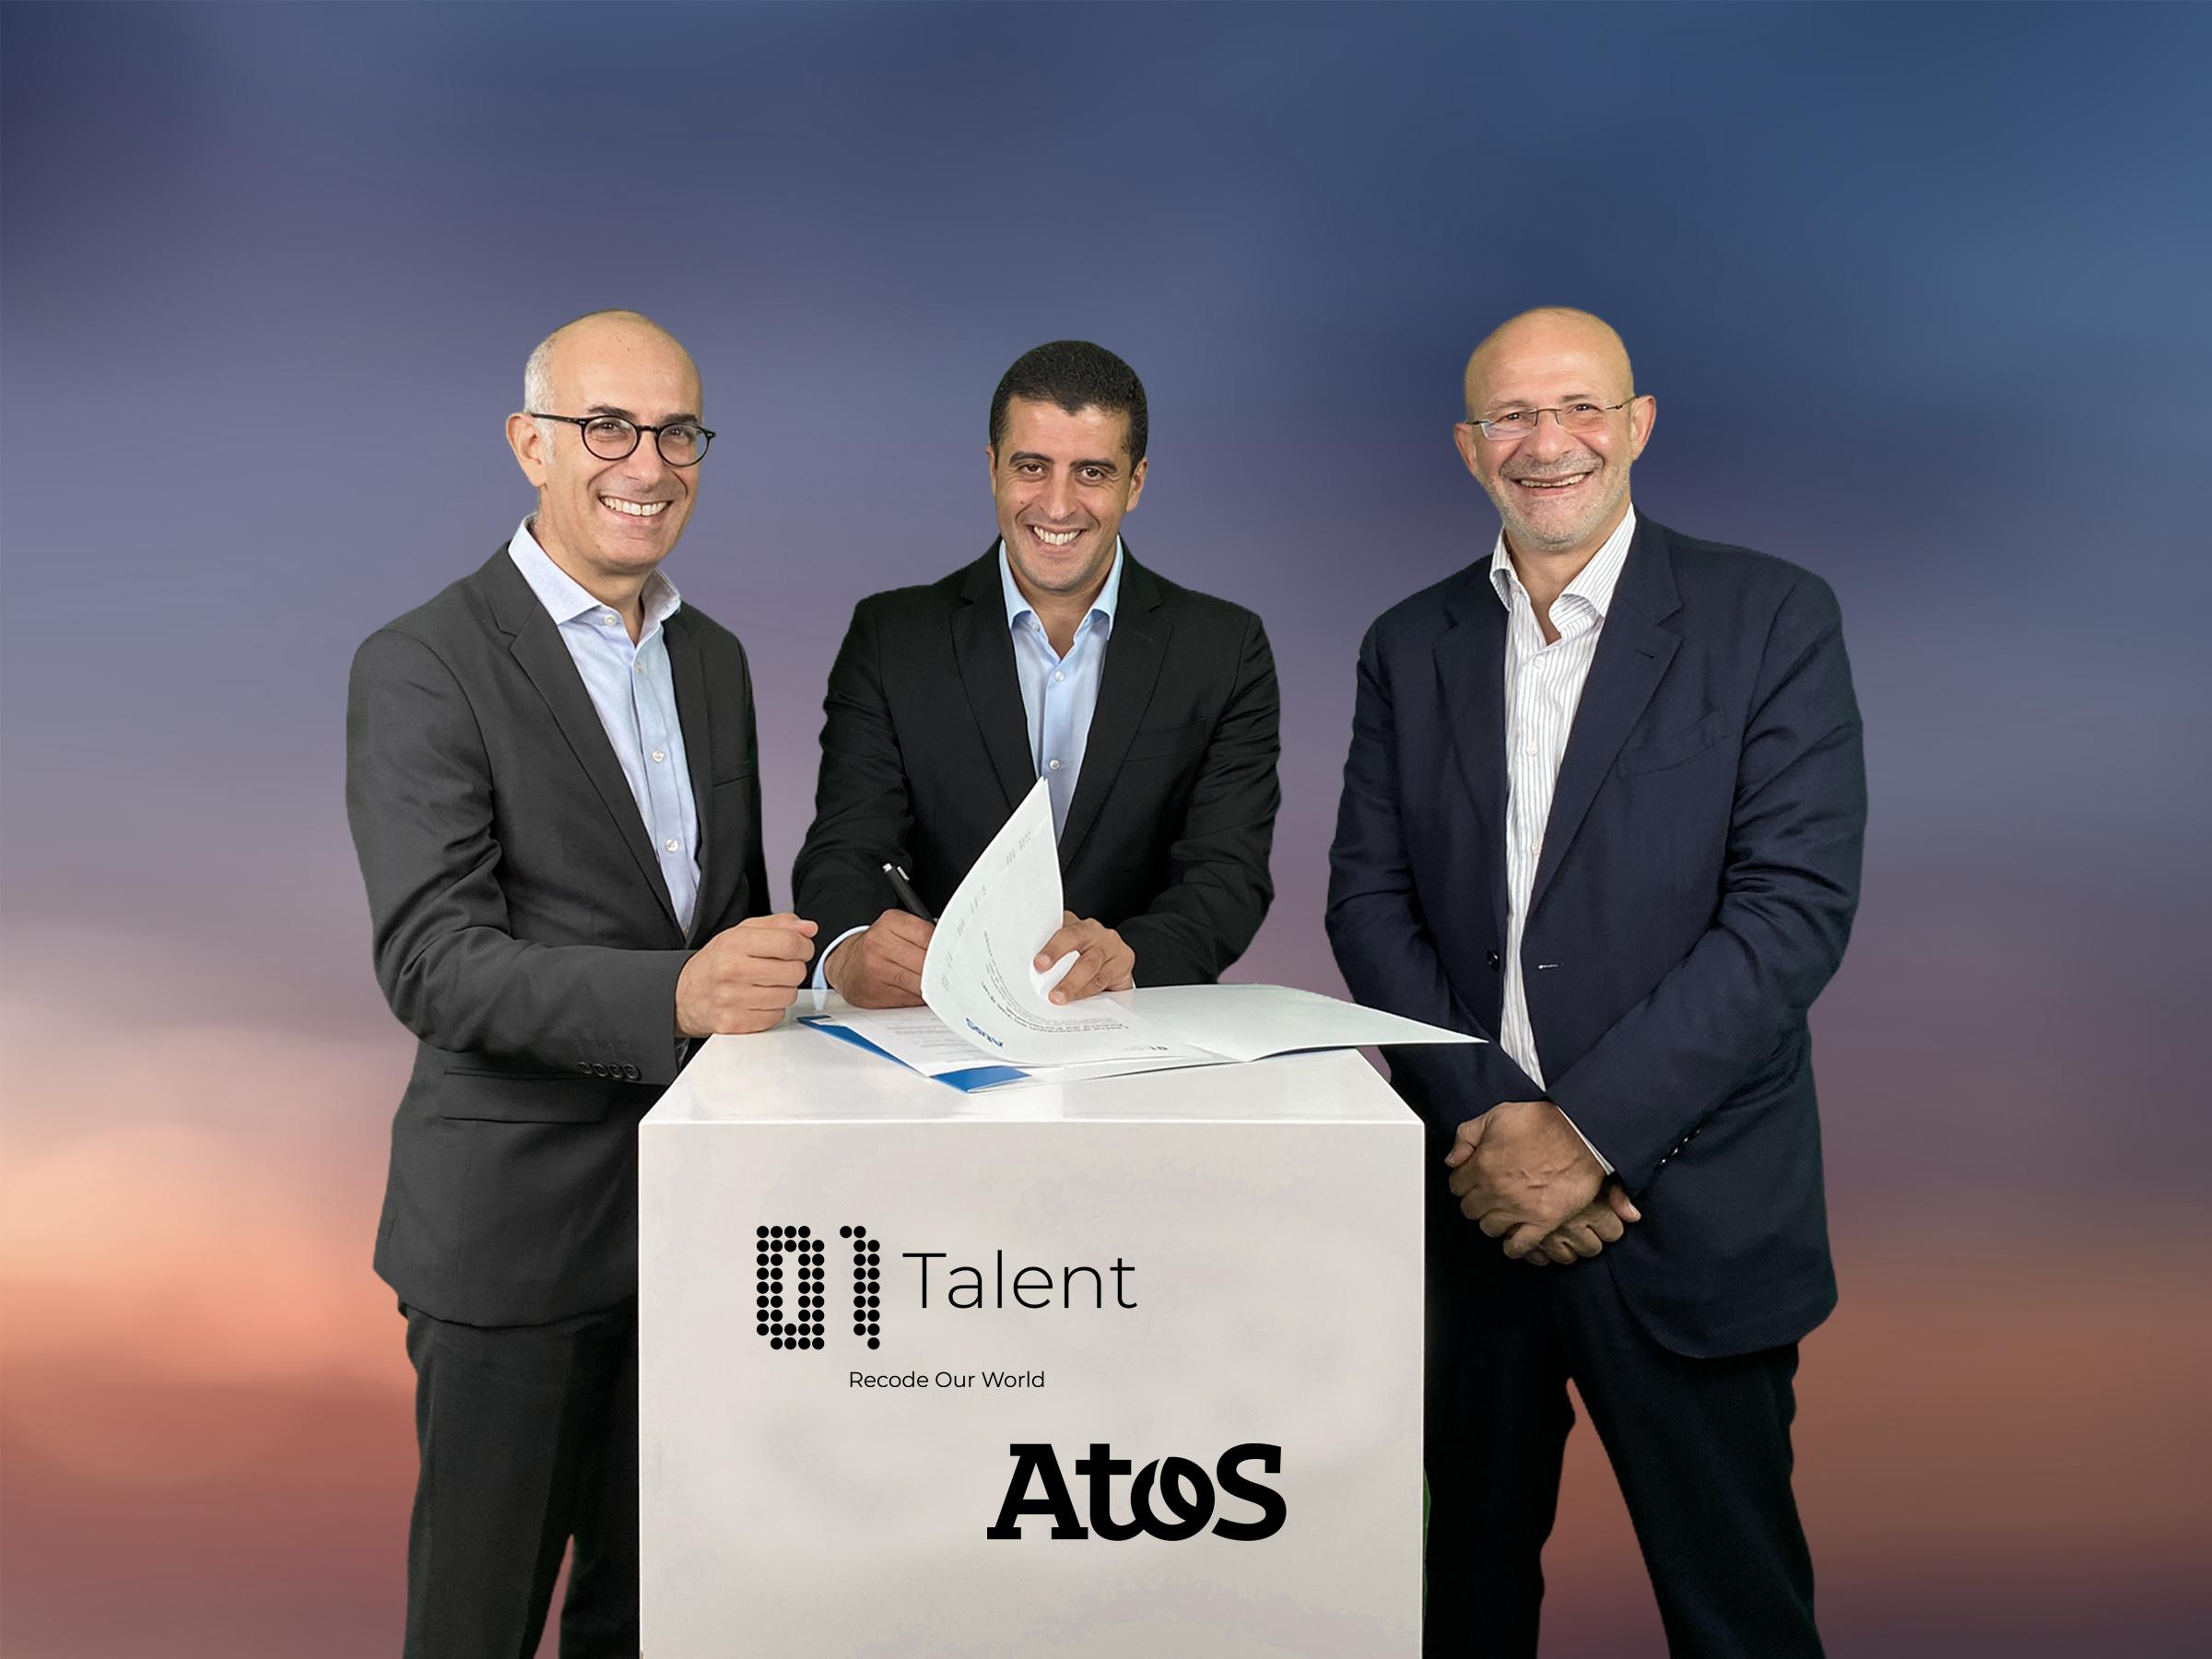 ATOS: Partenariat avec 01Talent en Afrique